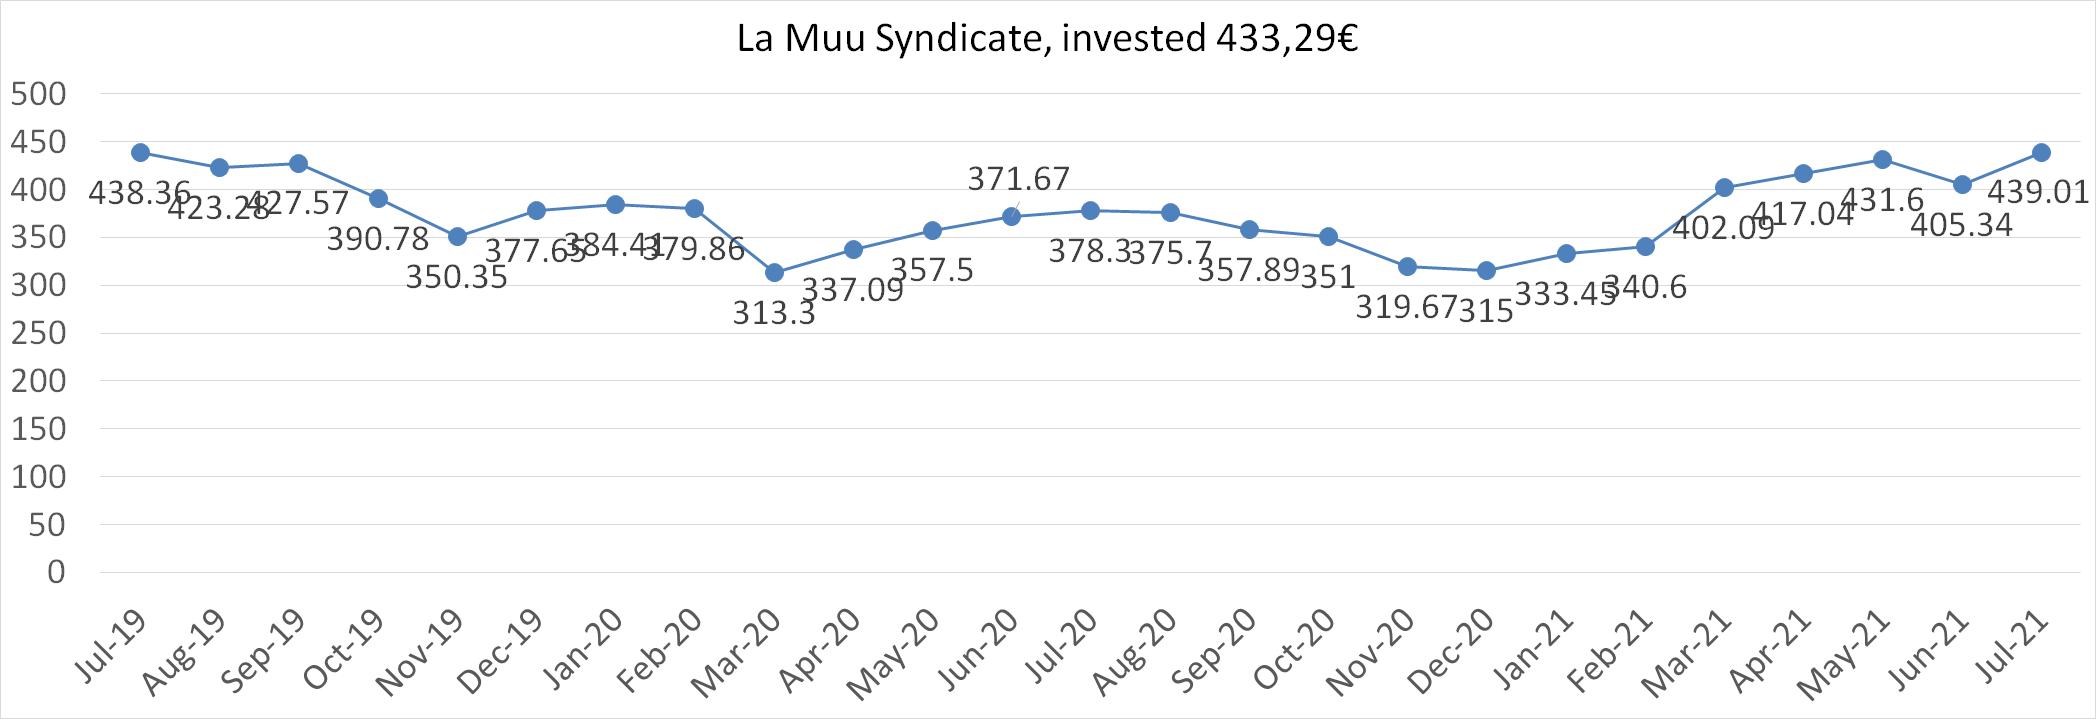 La muu syndicate worth july 2021